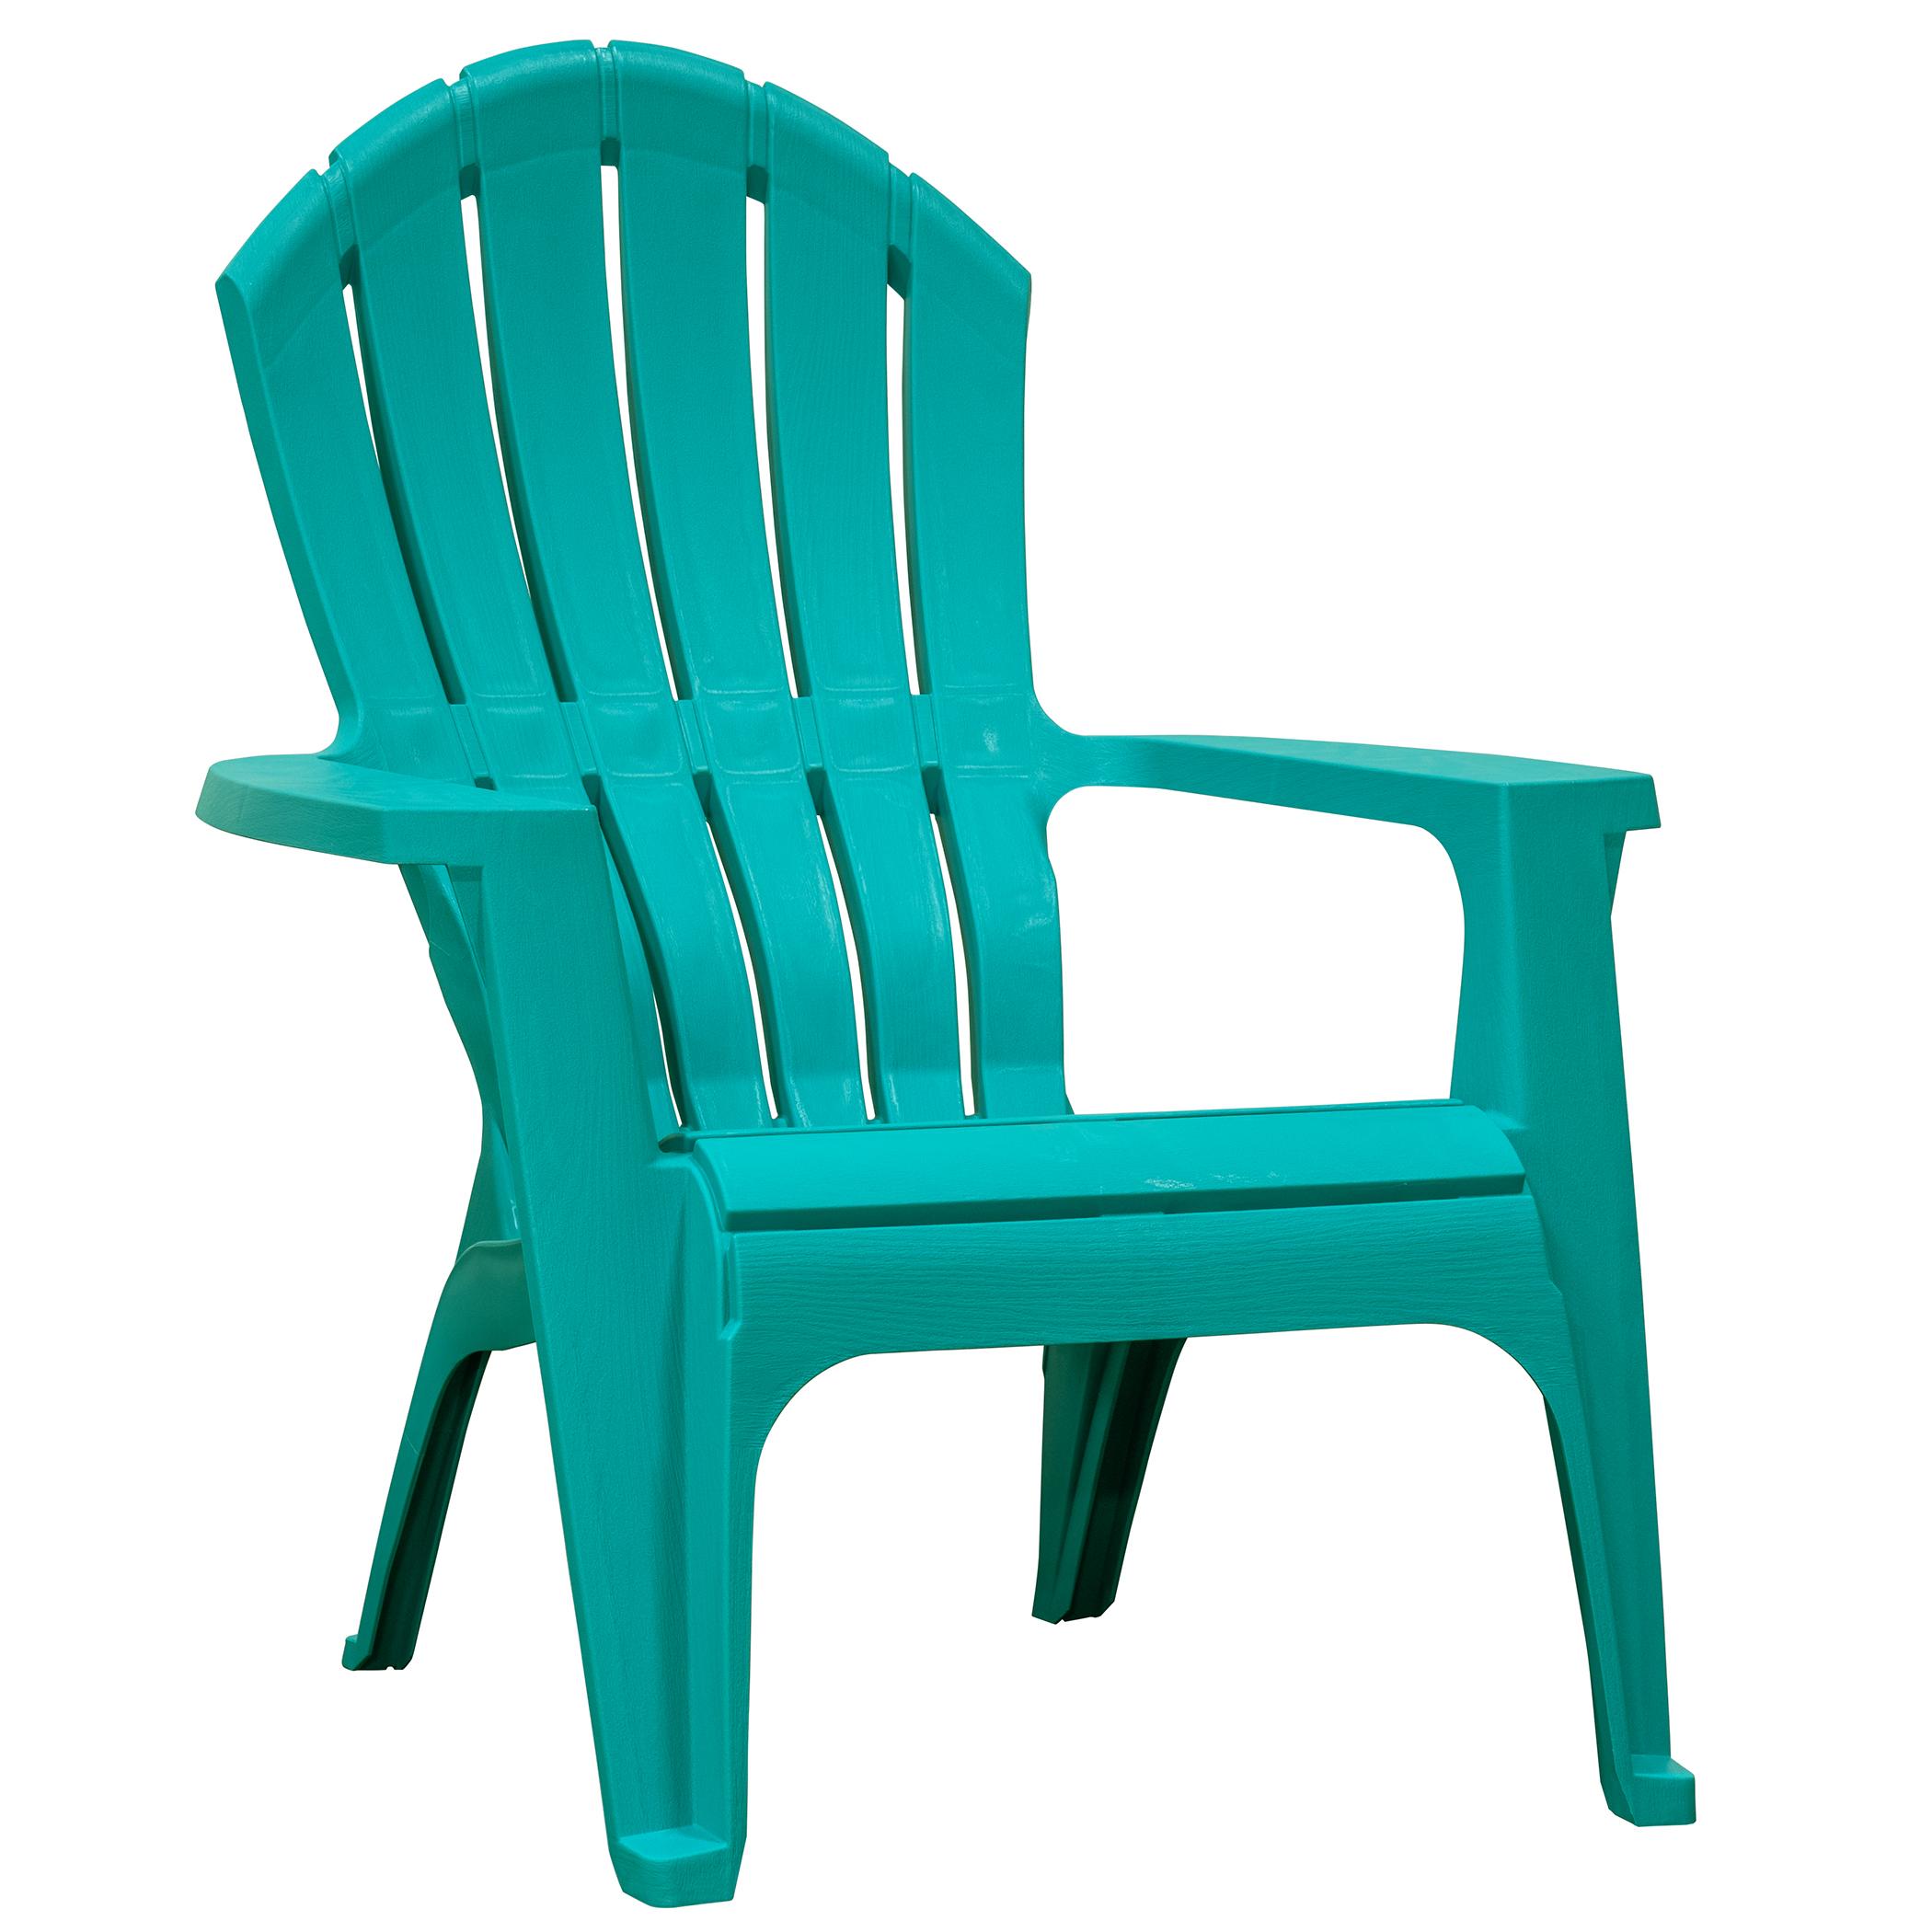 Adirondack-stol